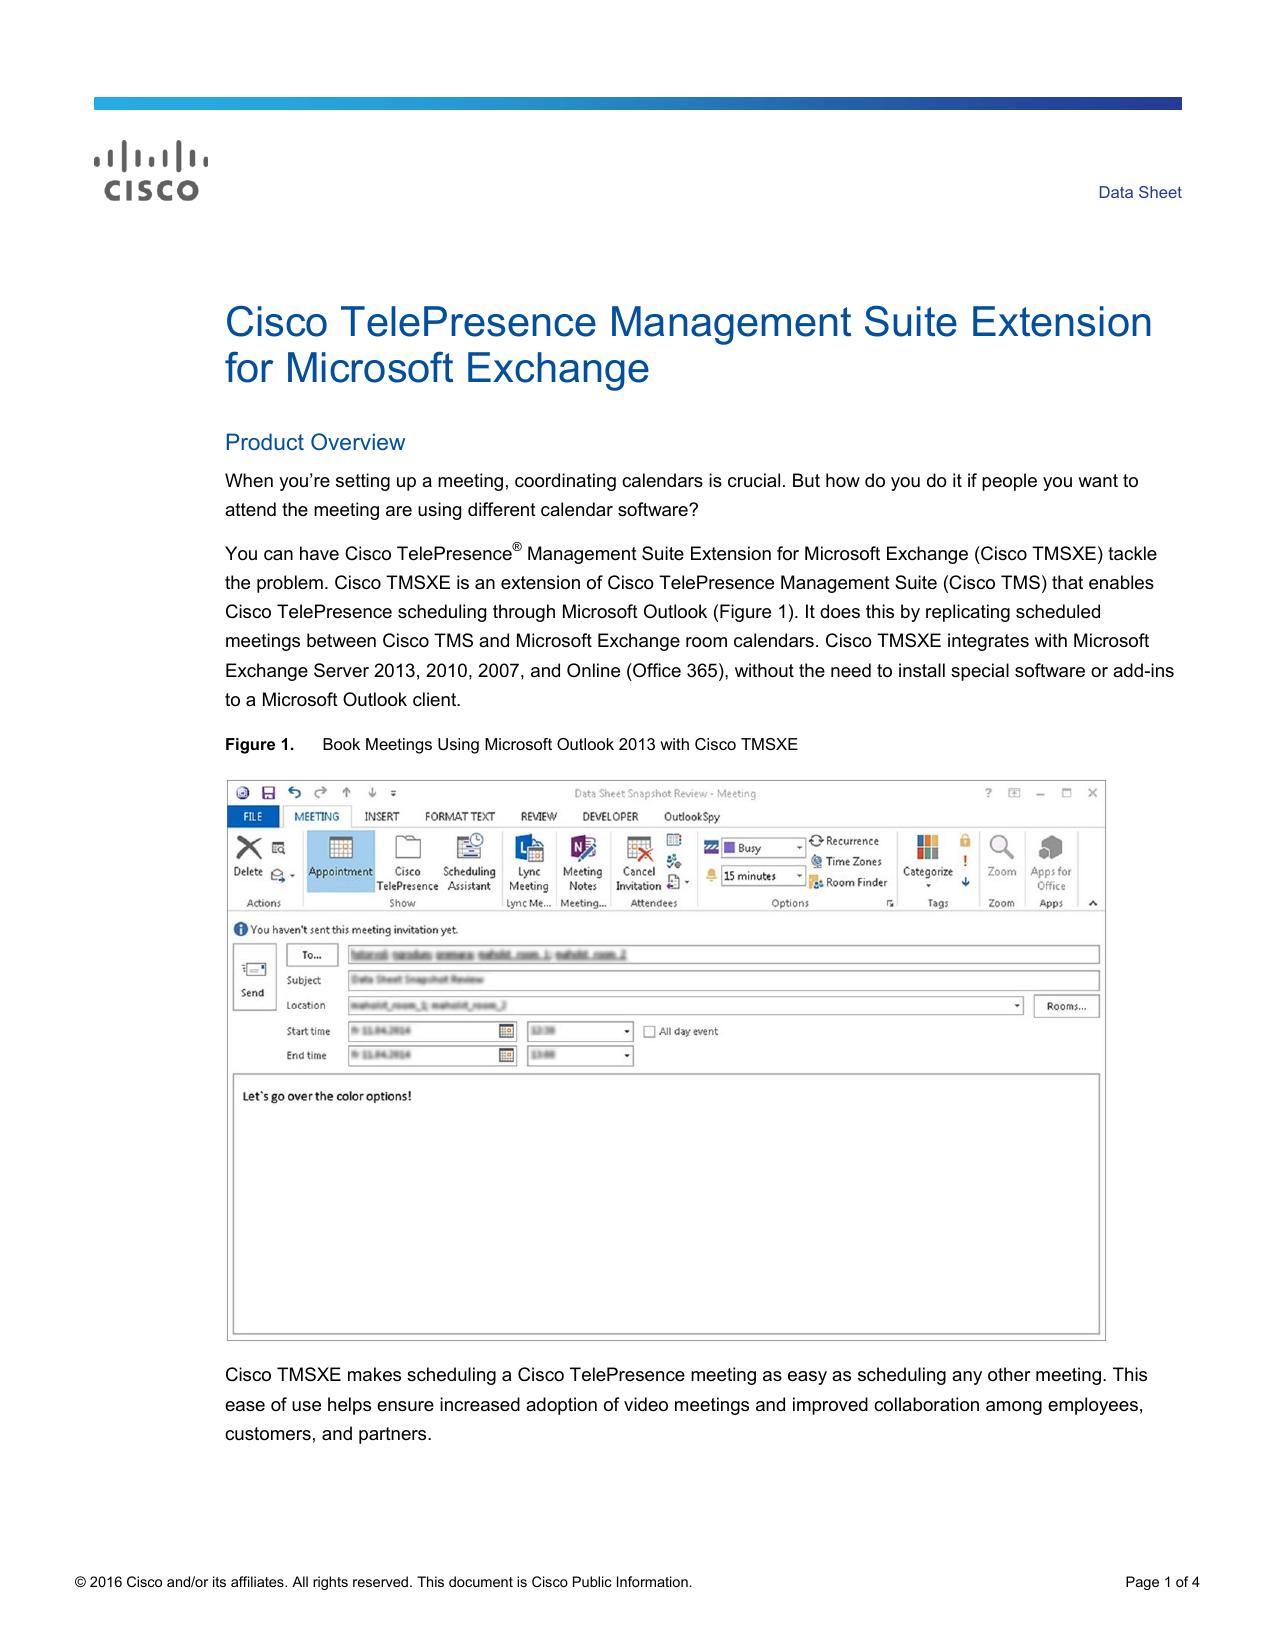 Cisco TelePresence Management Suite Extension for Microsoft